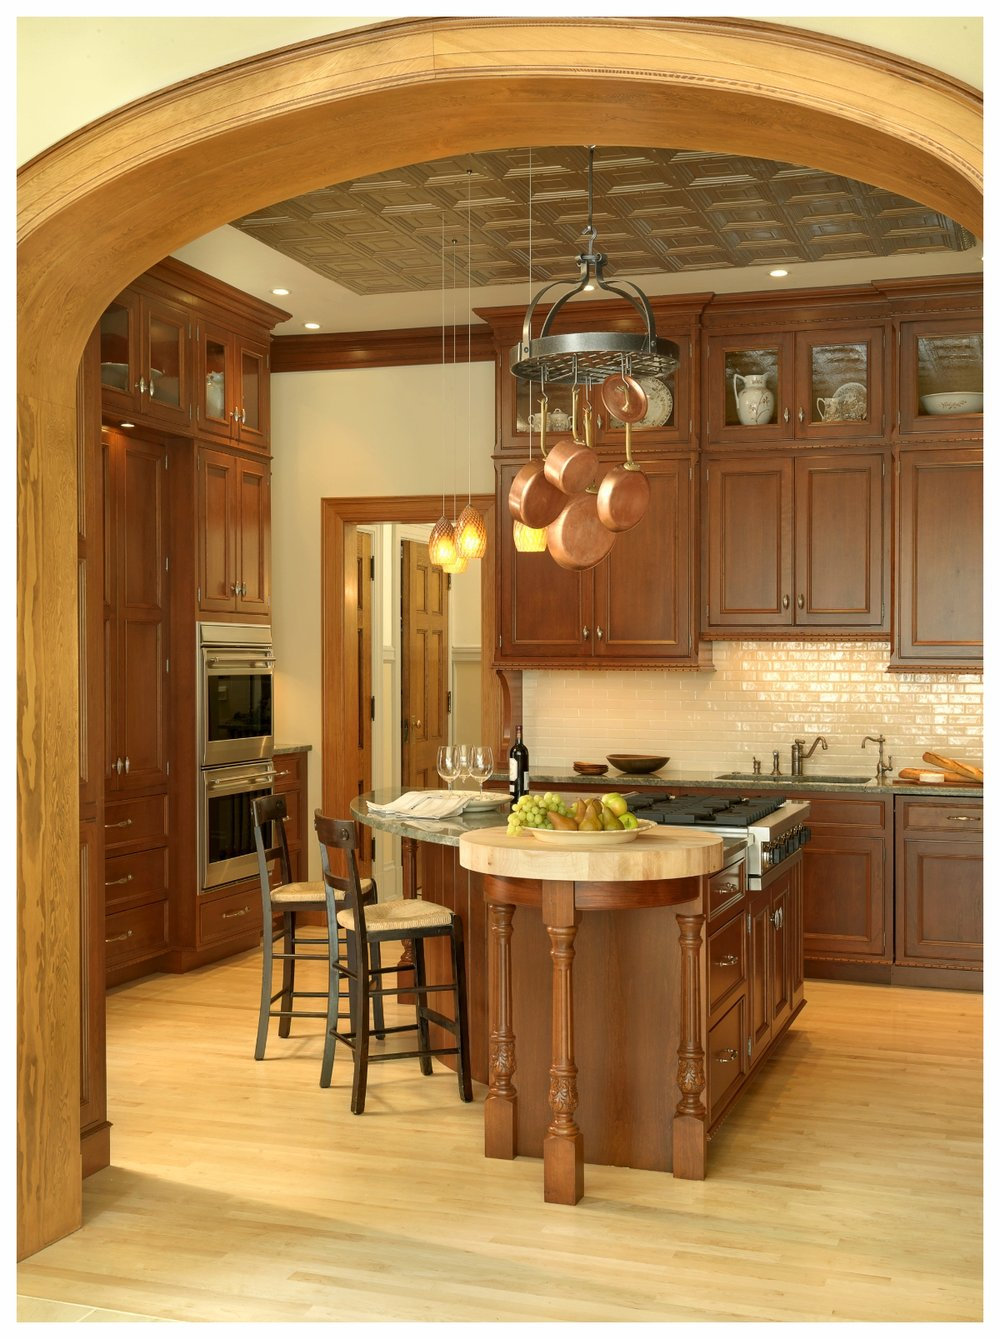 kitchen-small .jpg